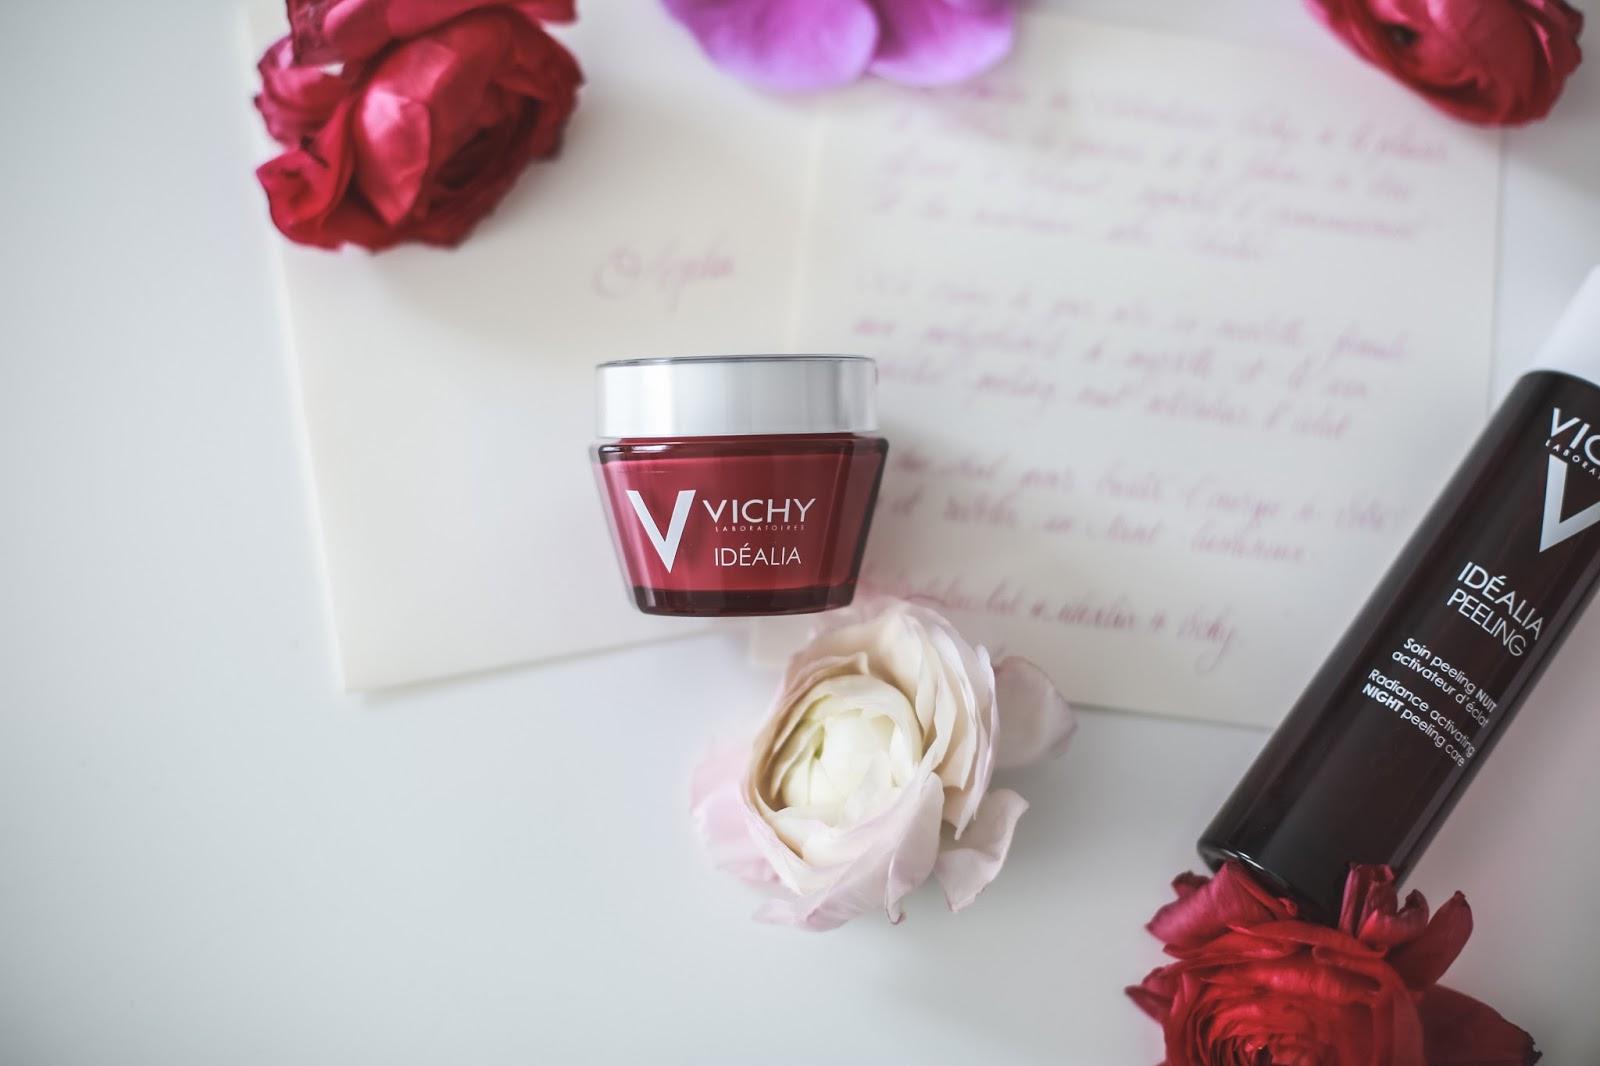 Vichy Idealia Peeling